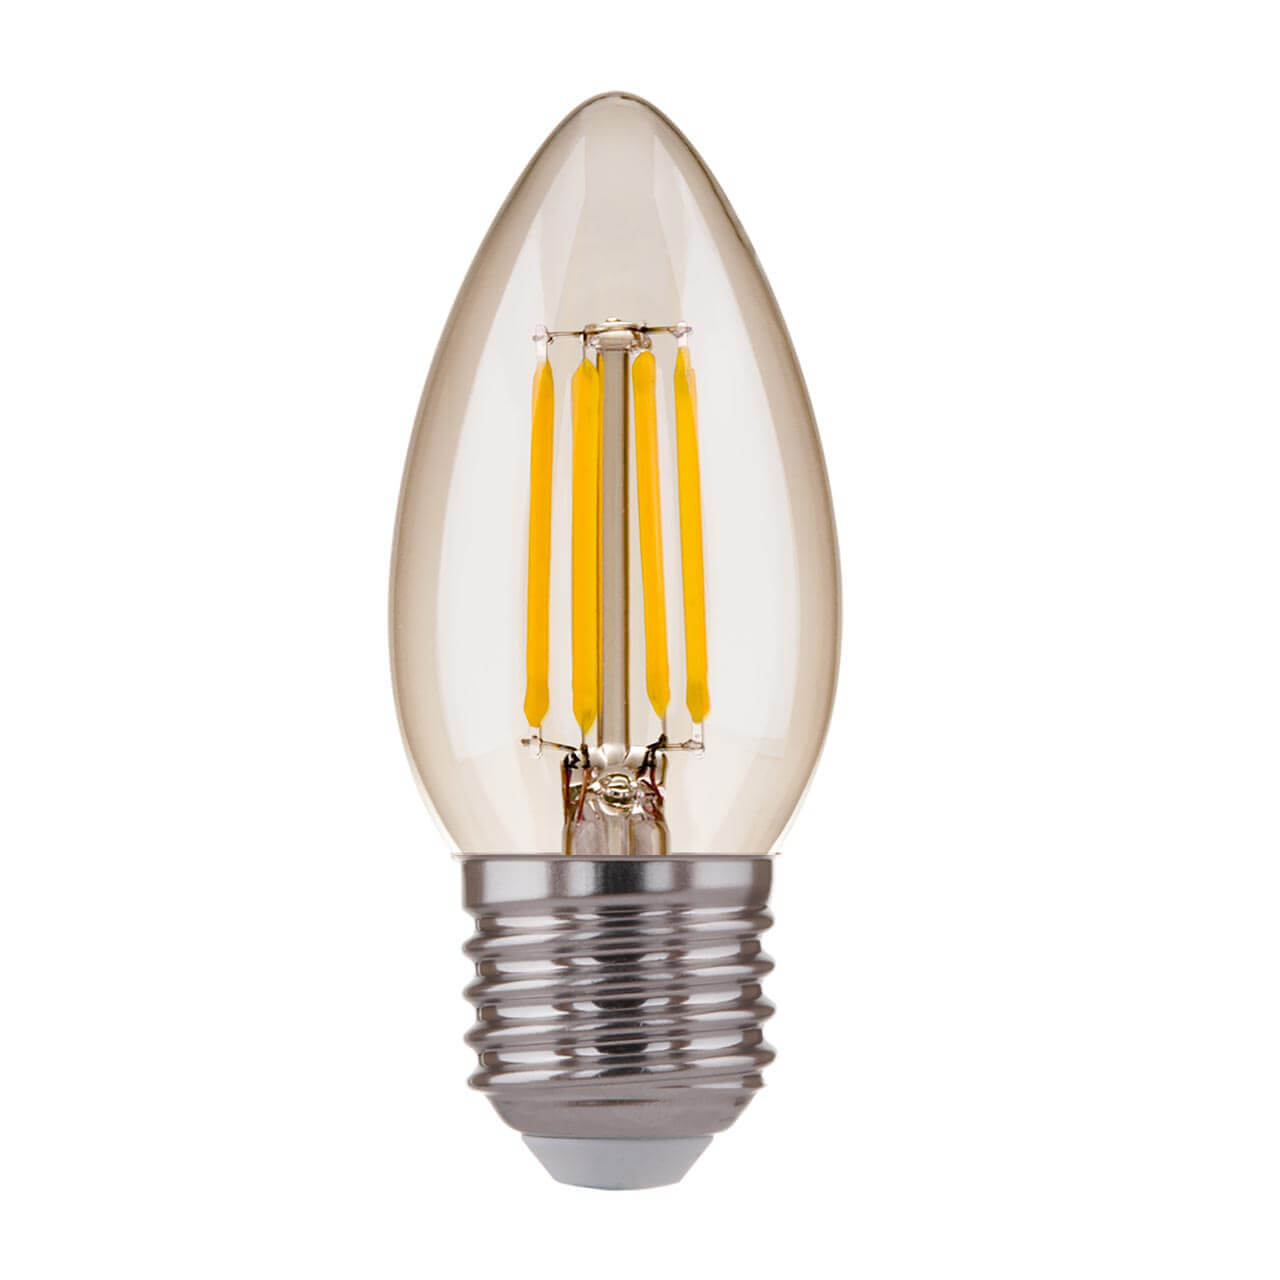 Лампа светодиодная филаментная Elektrostandard E27 7W 3300K прозрачная 4690389125256